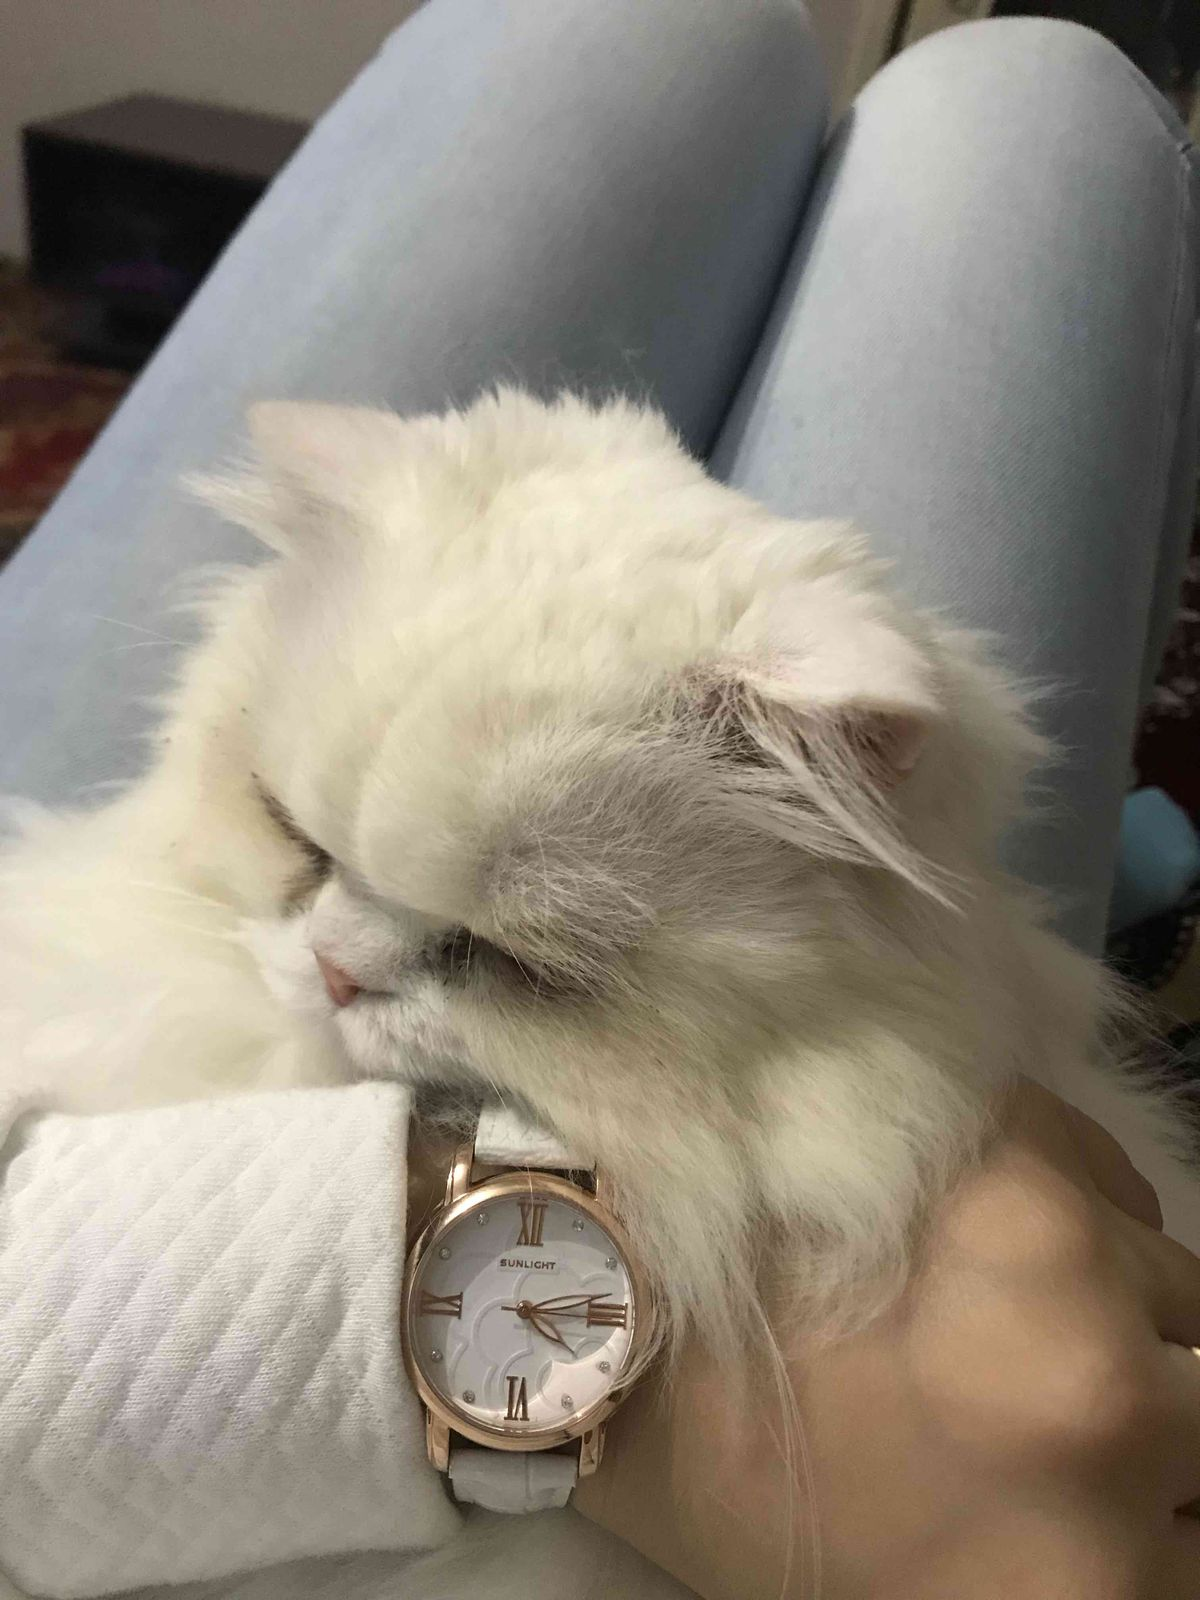 Часы великолепны